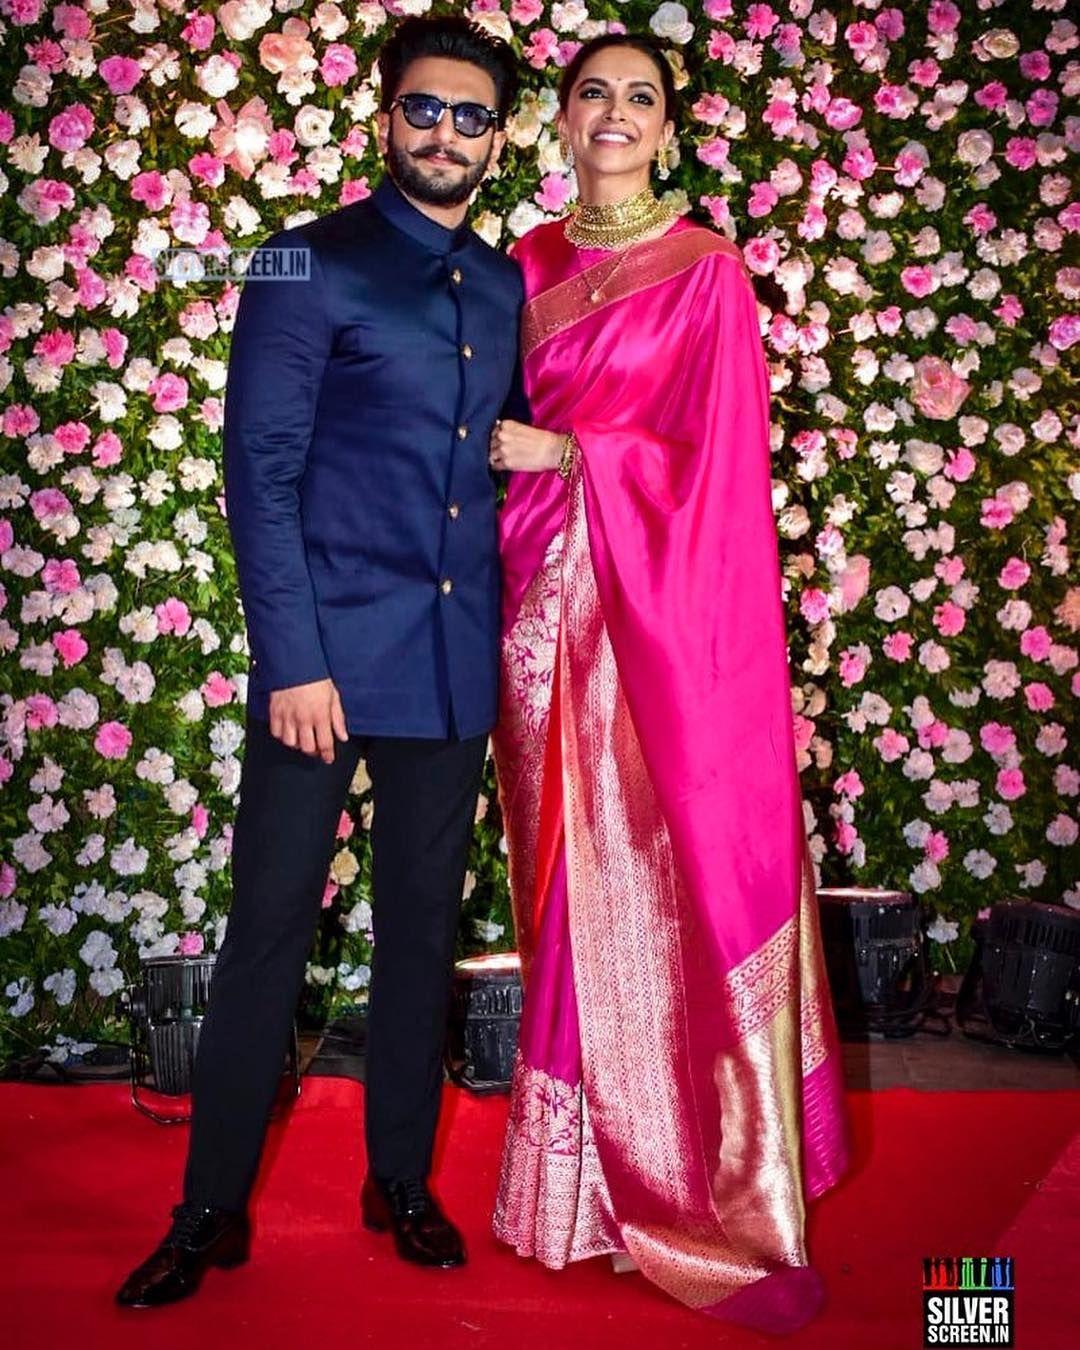 Wowza Deepikapadukone With Her Husband Ranveersingh At The Kapilsharma S Recep Wedding Dresses Men Indian Indian Reception Outfit Indian Sari Dress